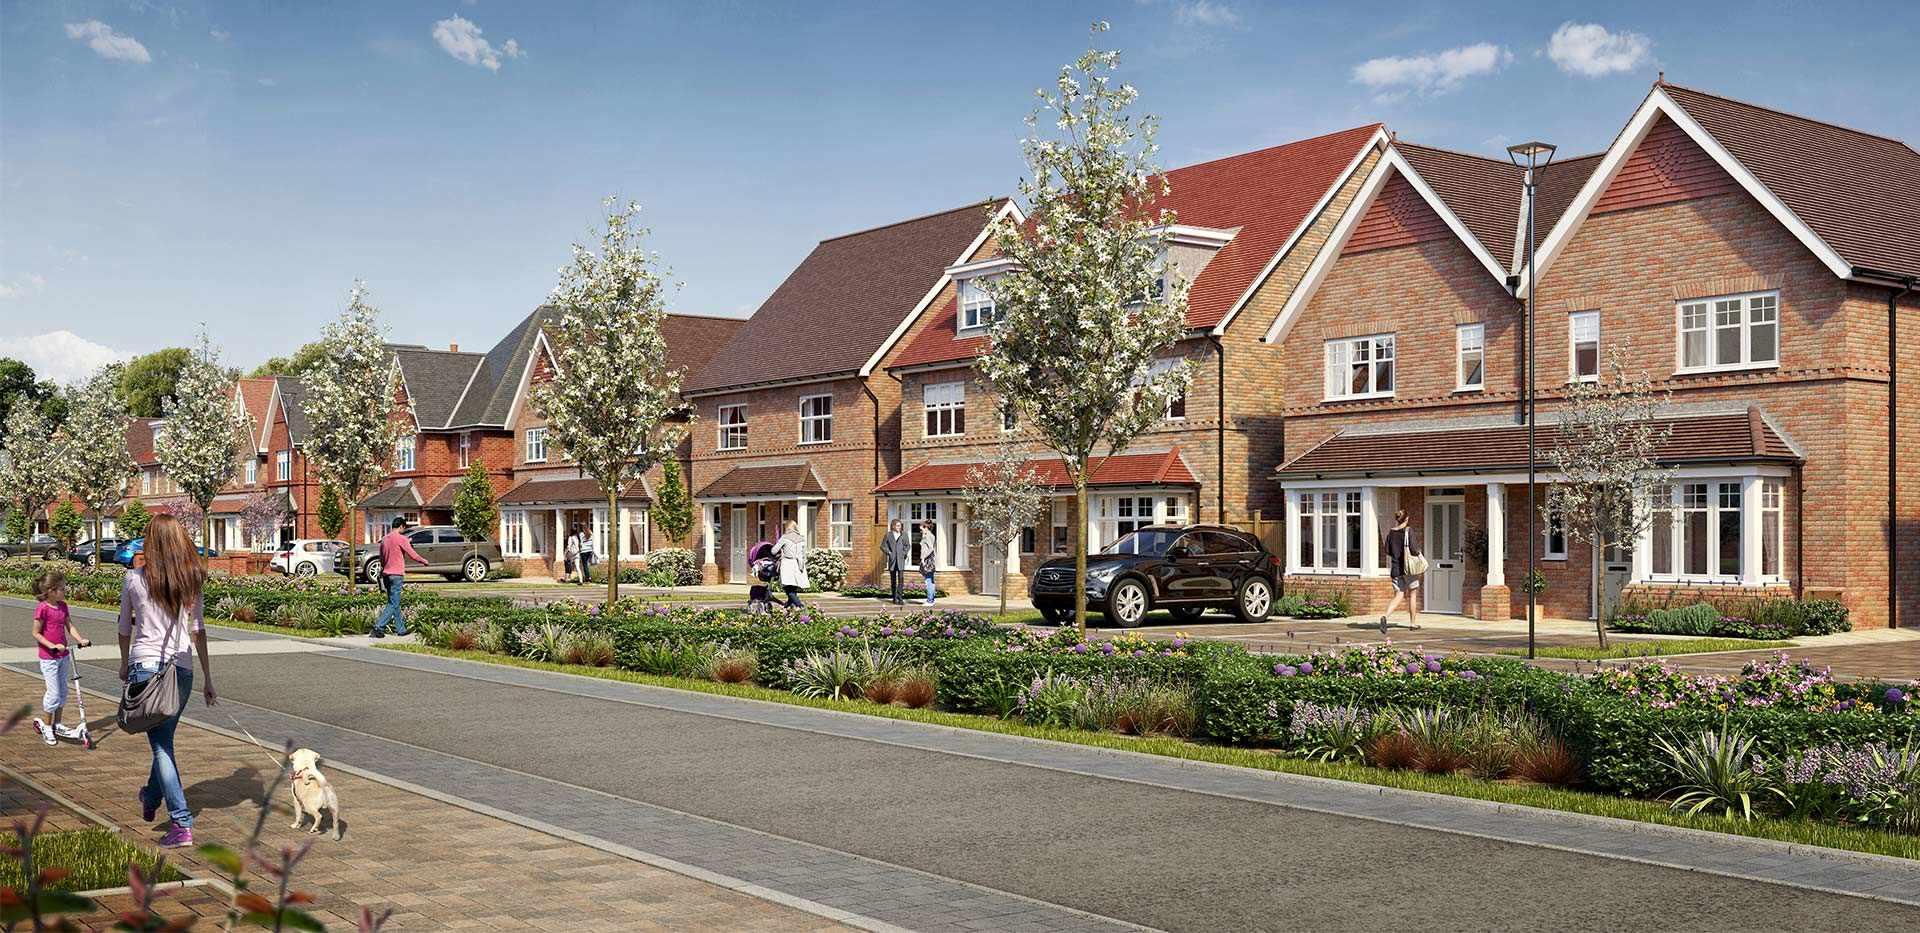 Highcroft | Houses | Wallingford